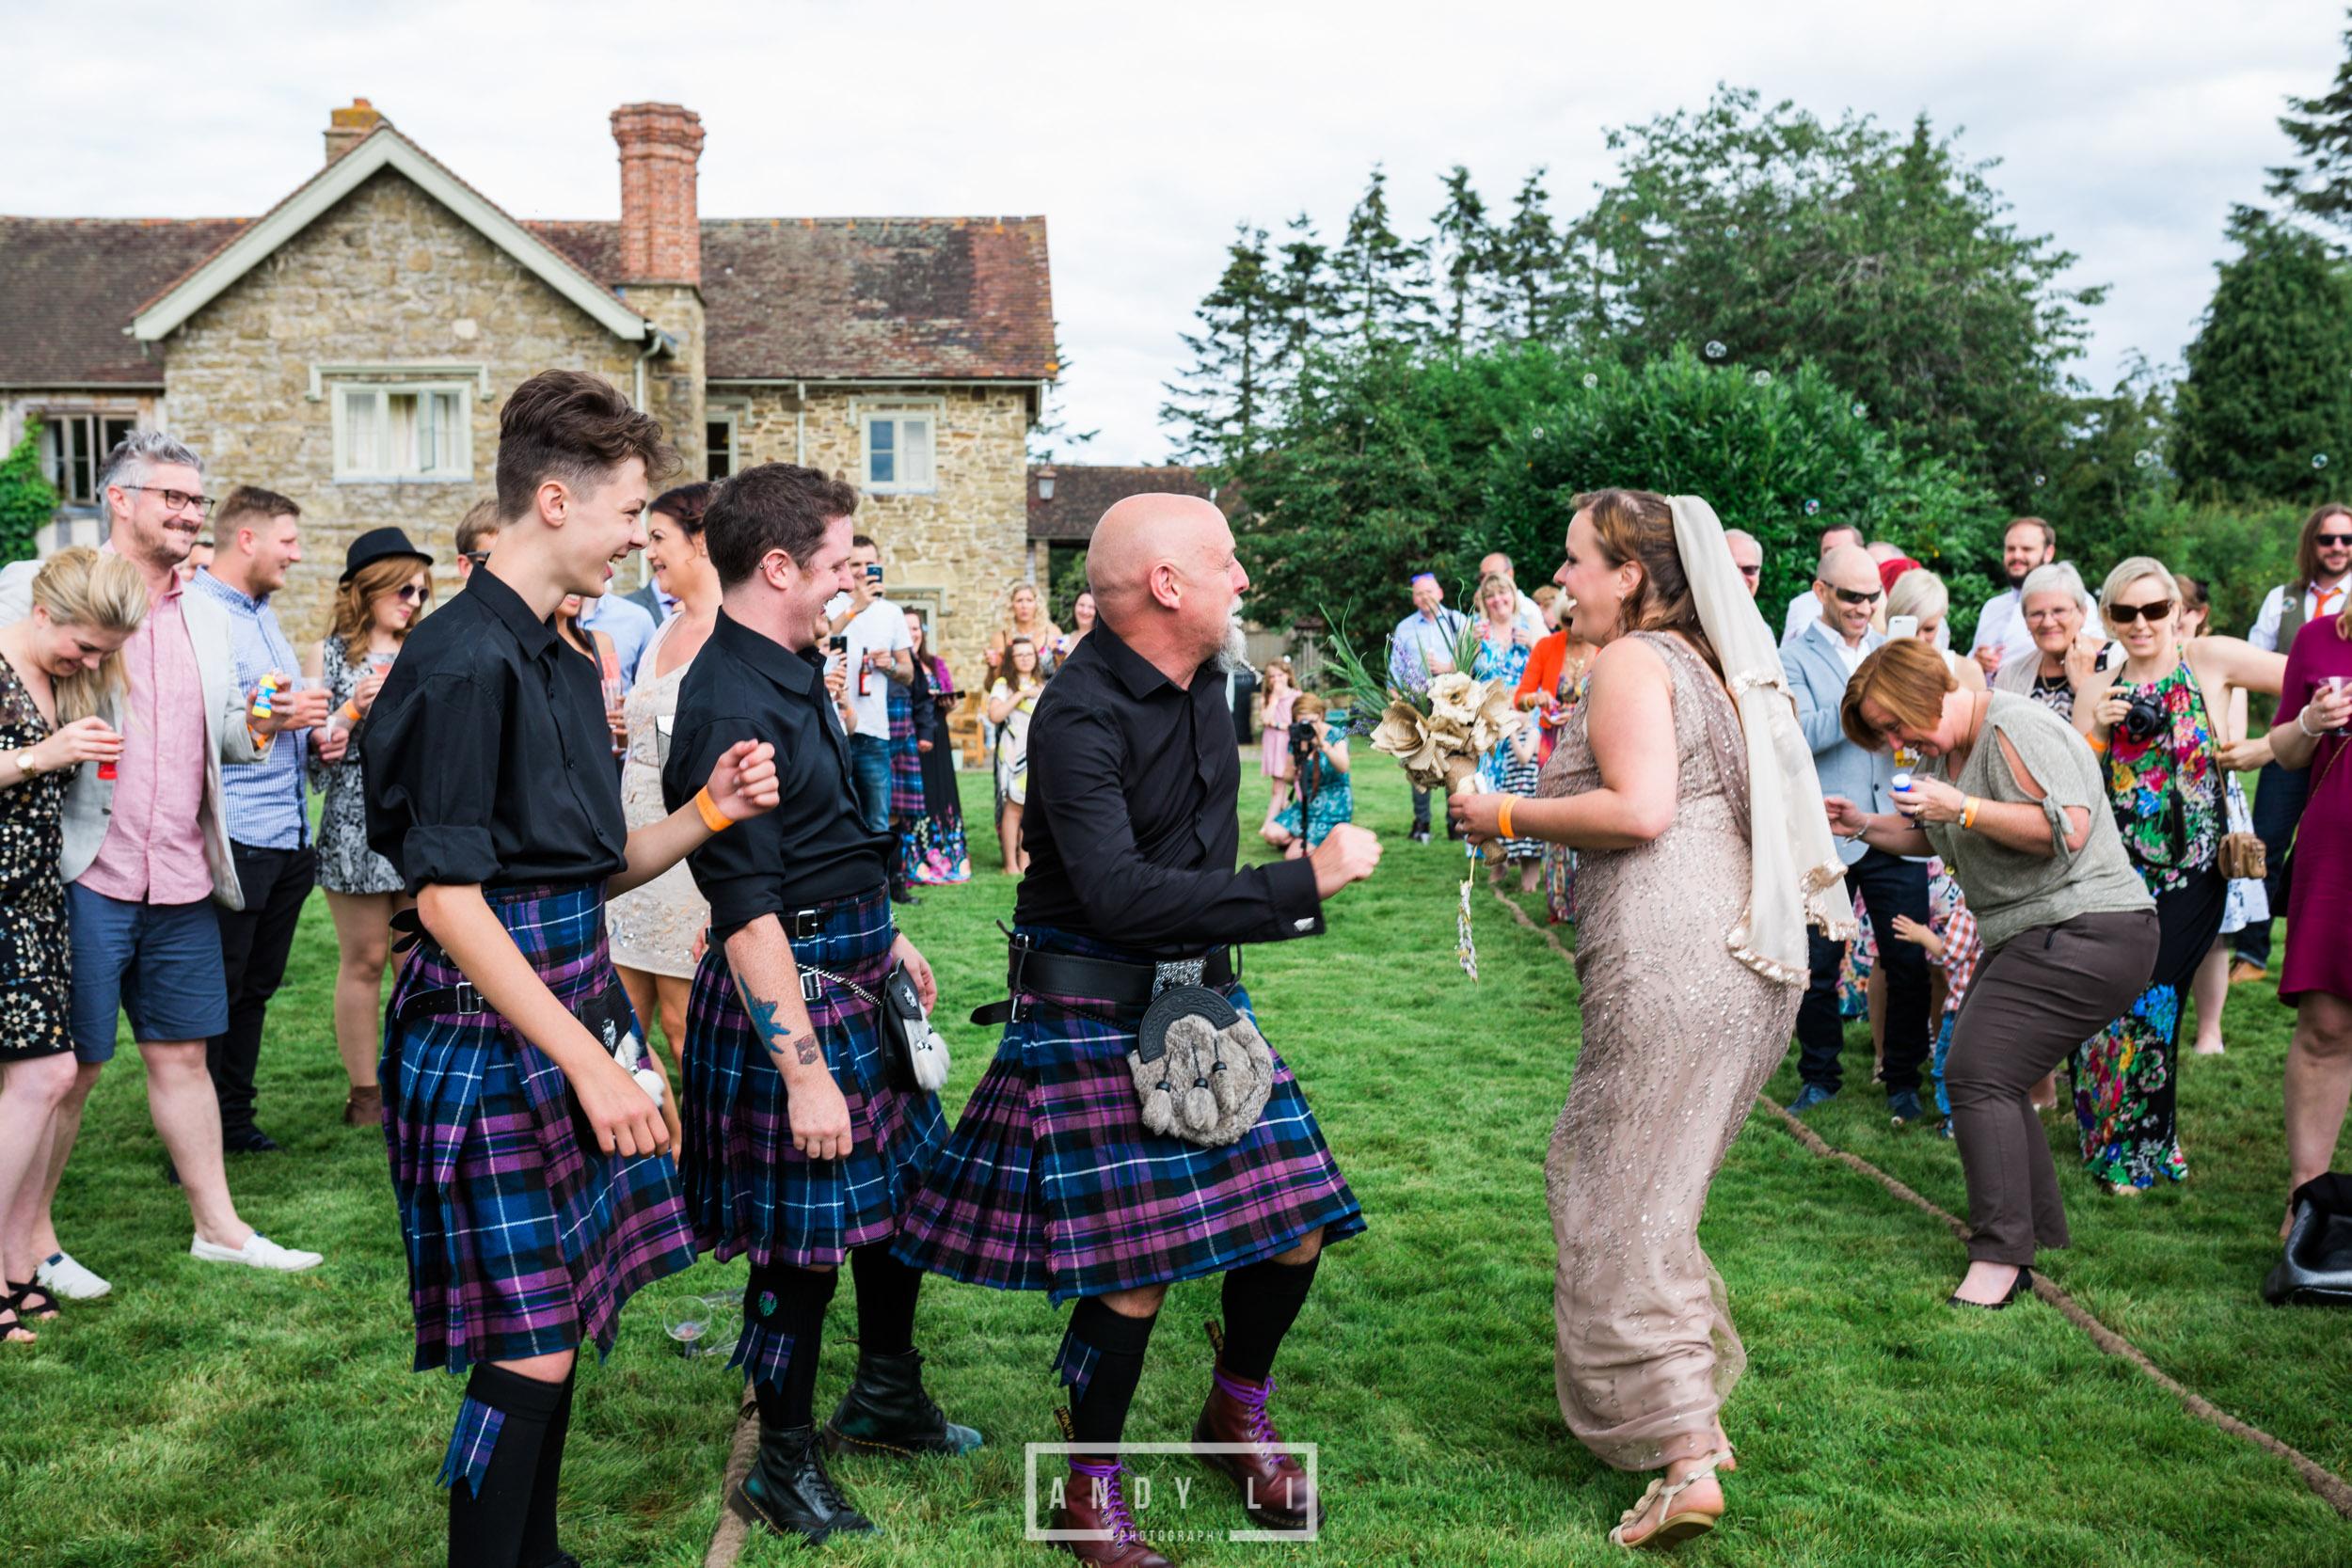 Festival Wedding Shropshire-Andy Li Photography-136.jpg